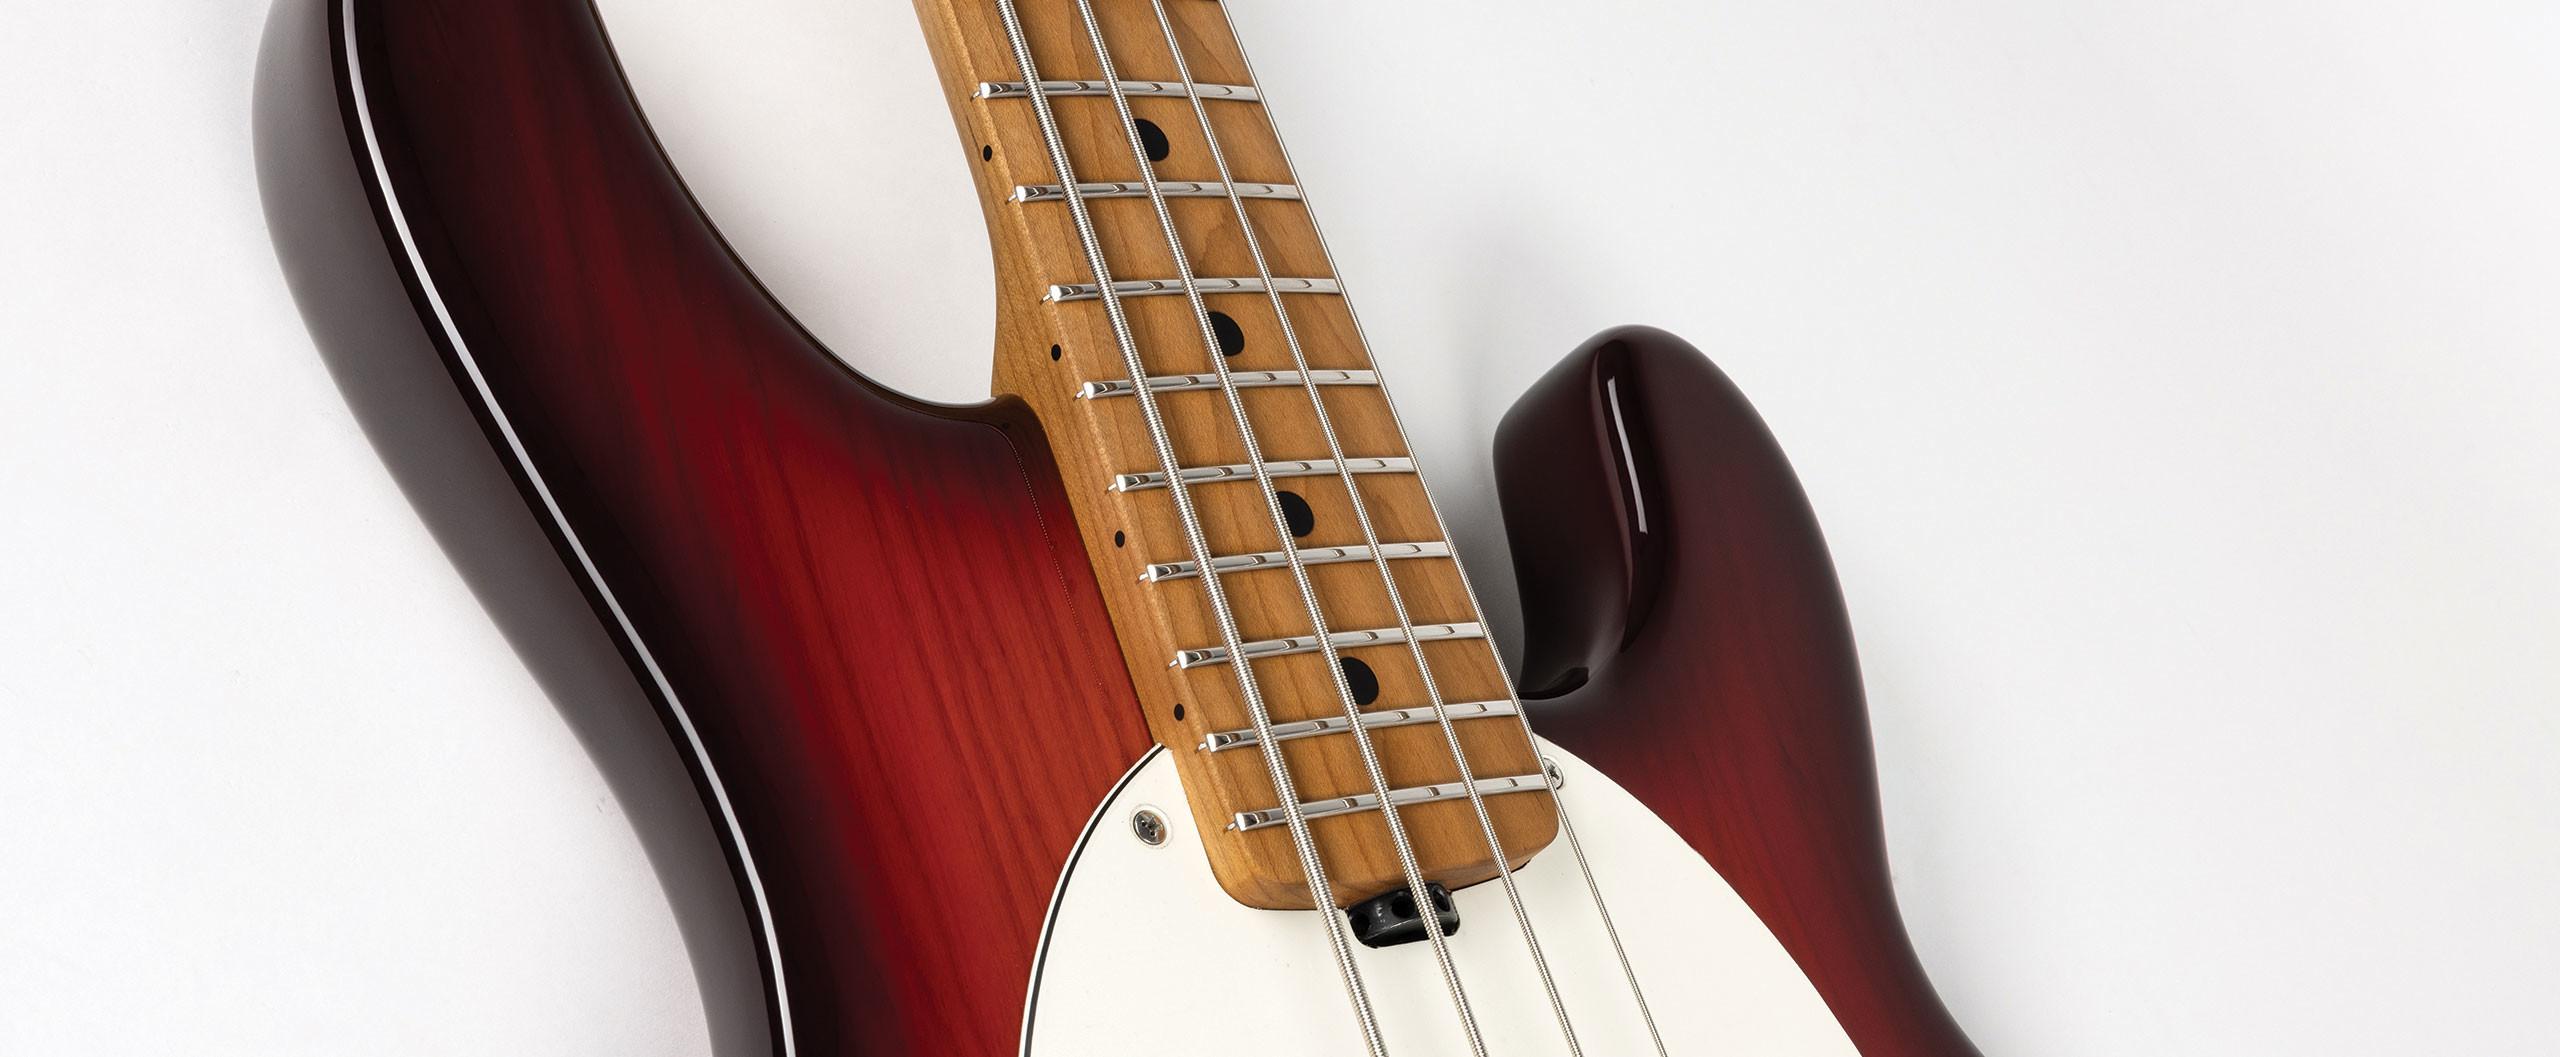 short scale stingray bass basses ernie ball music man. Black Bedroom Furniture Sets. Home Design Ideas